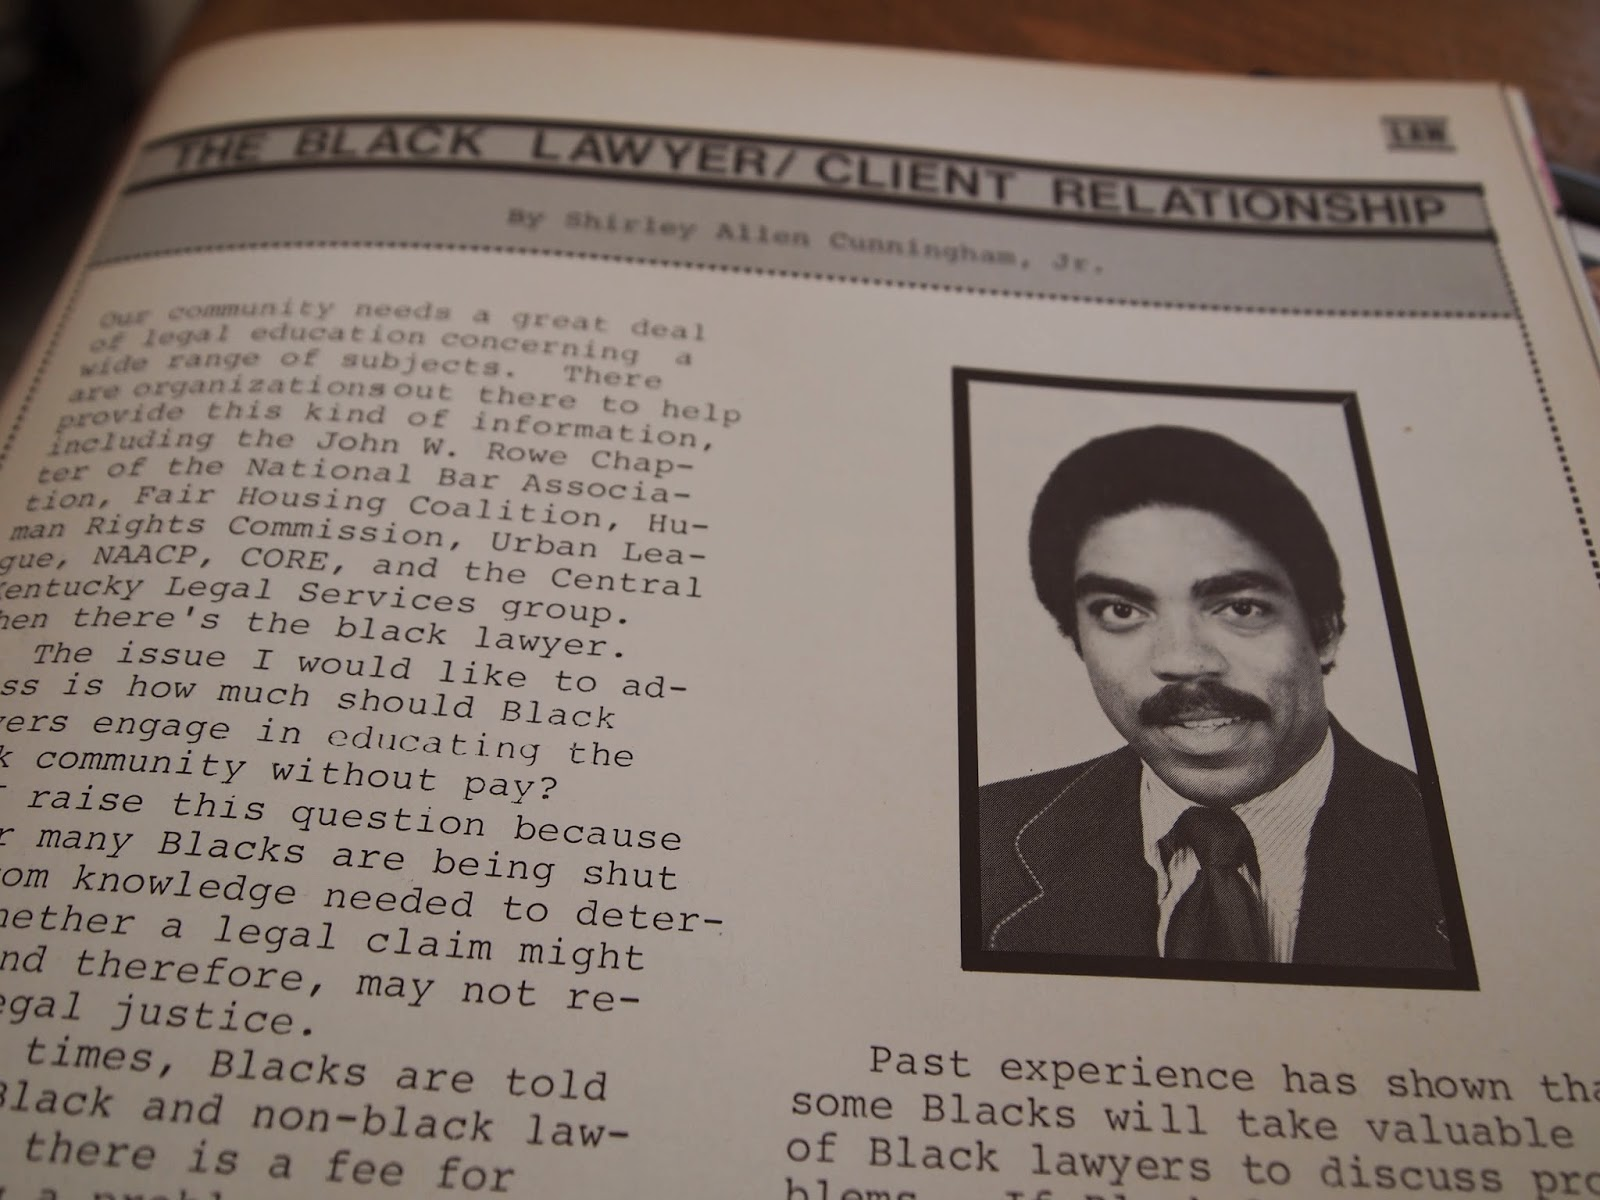 WINGCOM WATCHDOG (WW): Black community needs legal ...